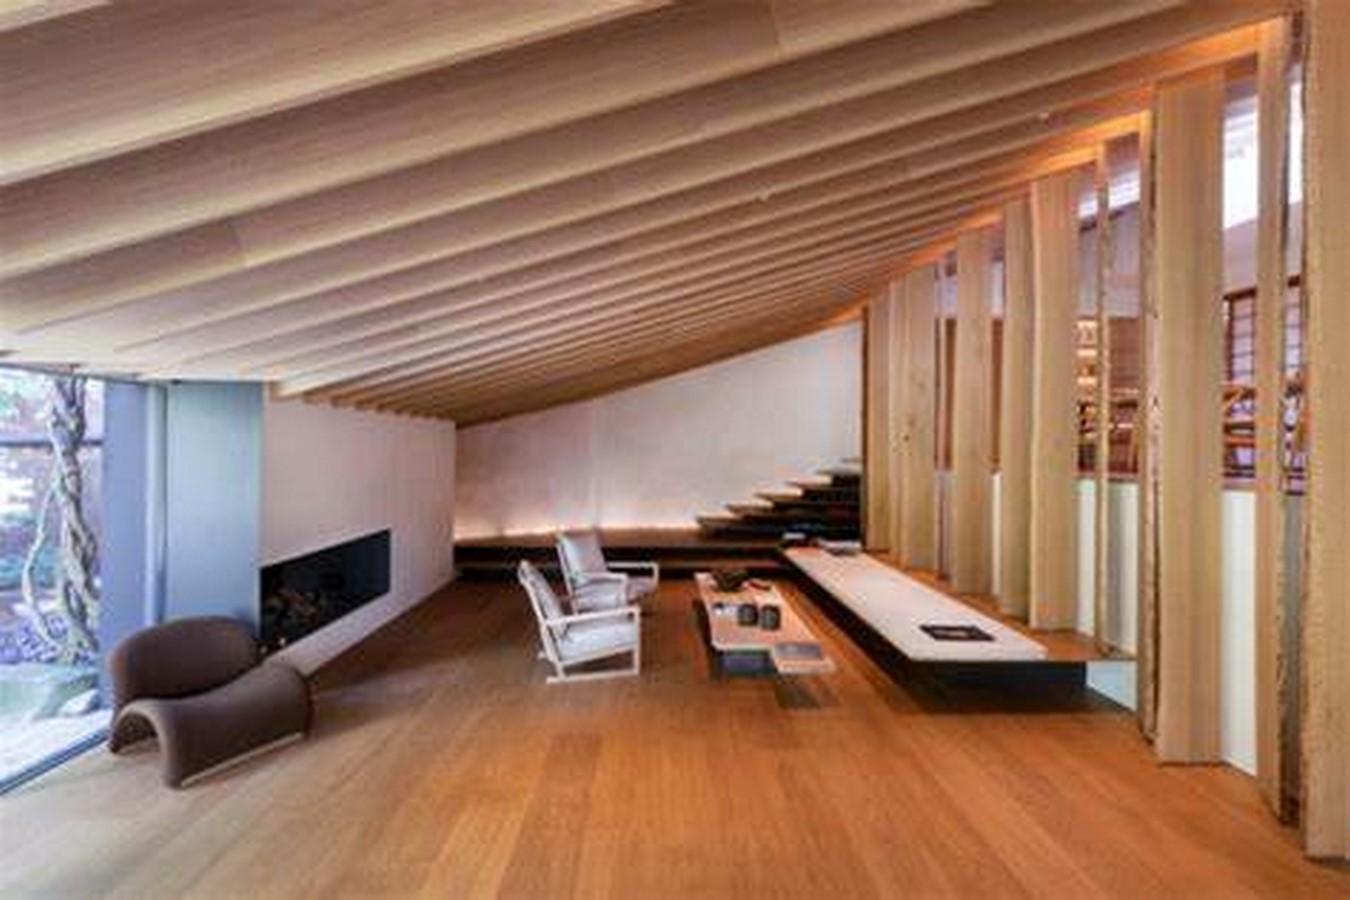 Kenzo House - Sheet1